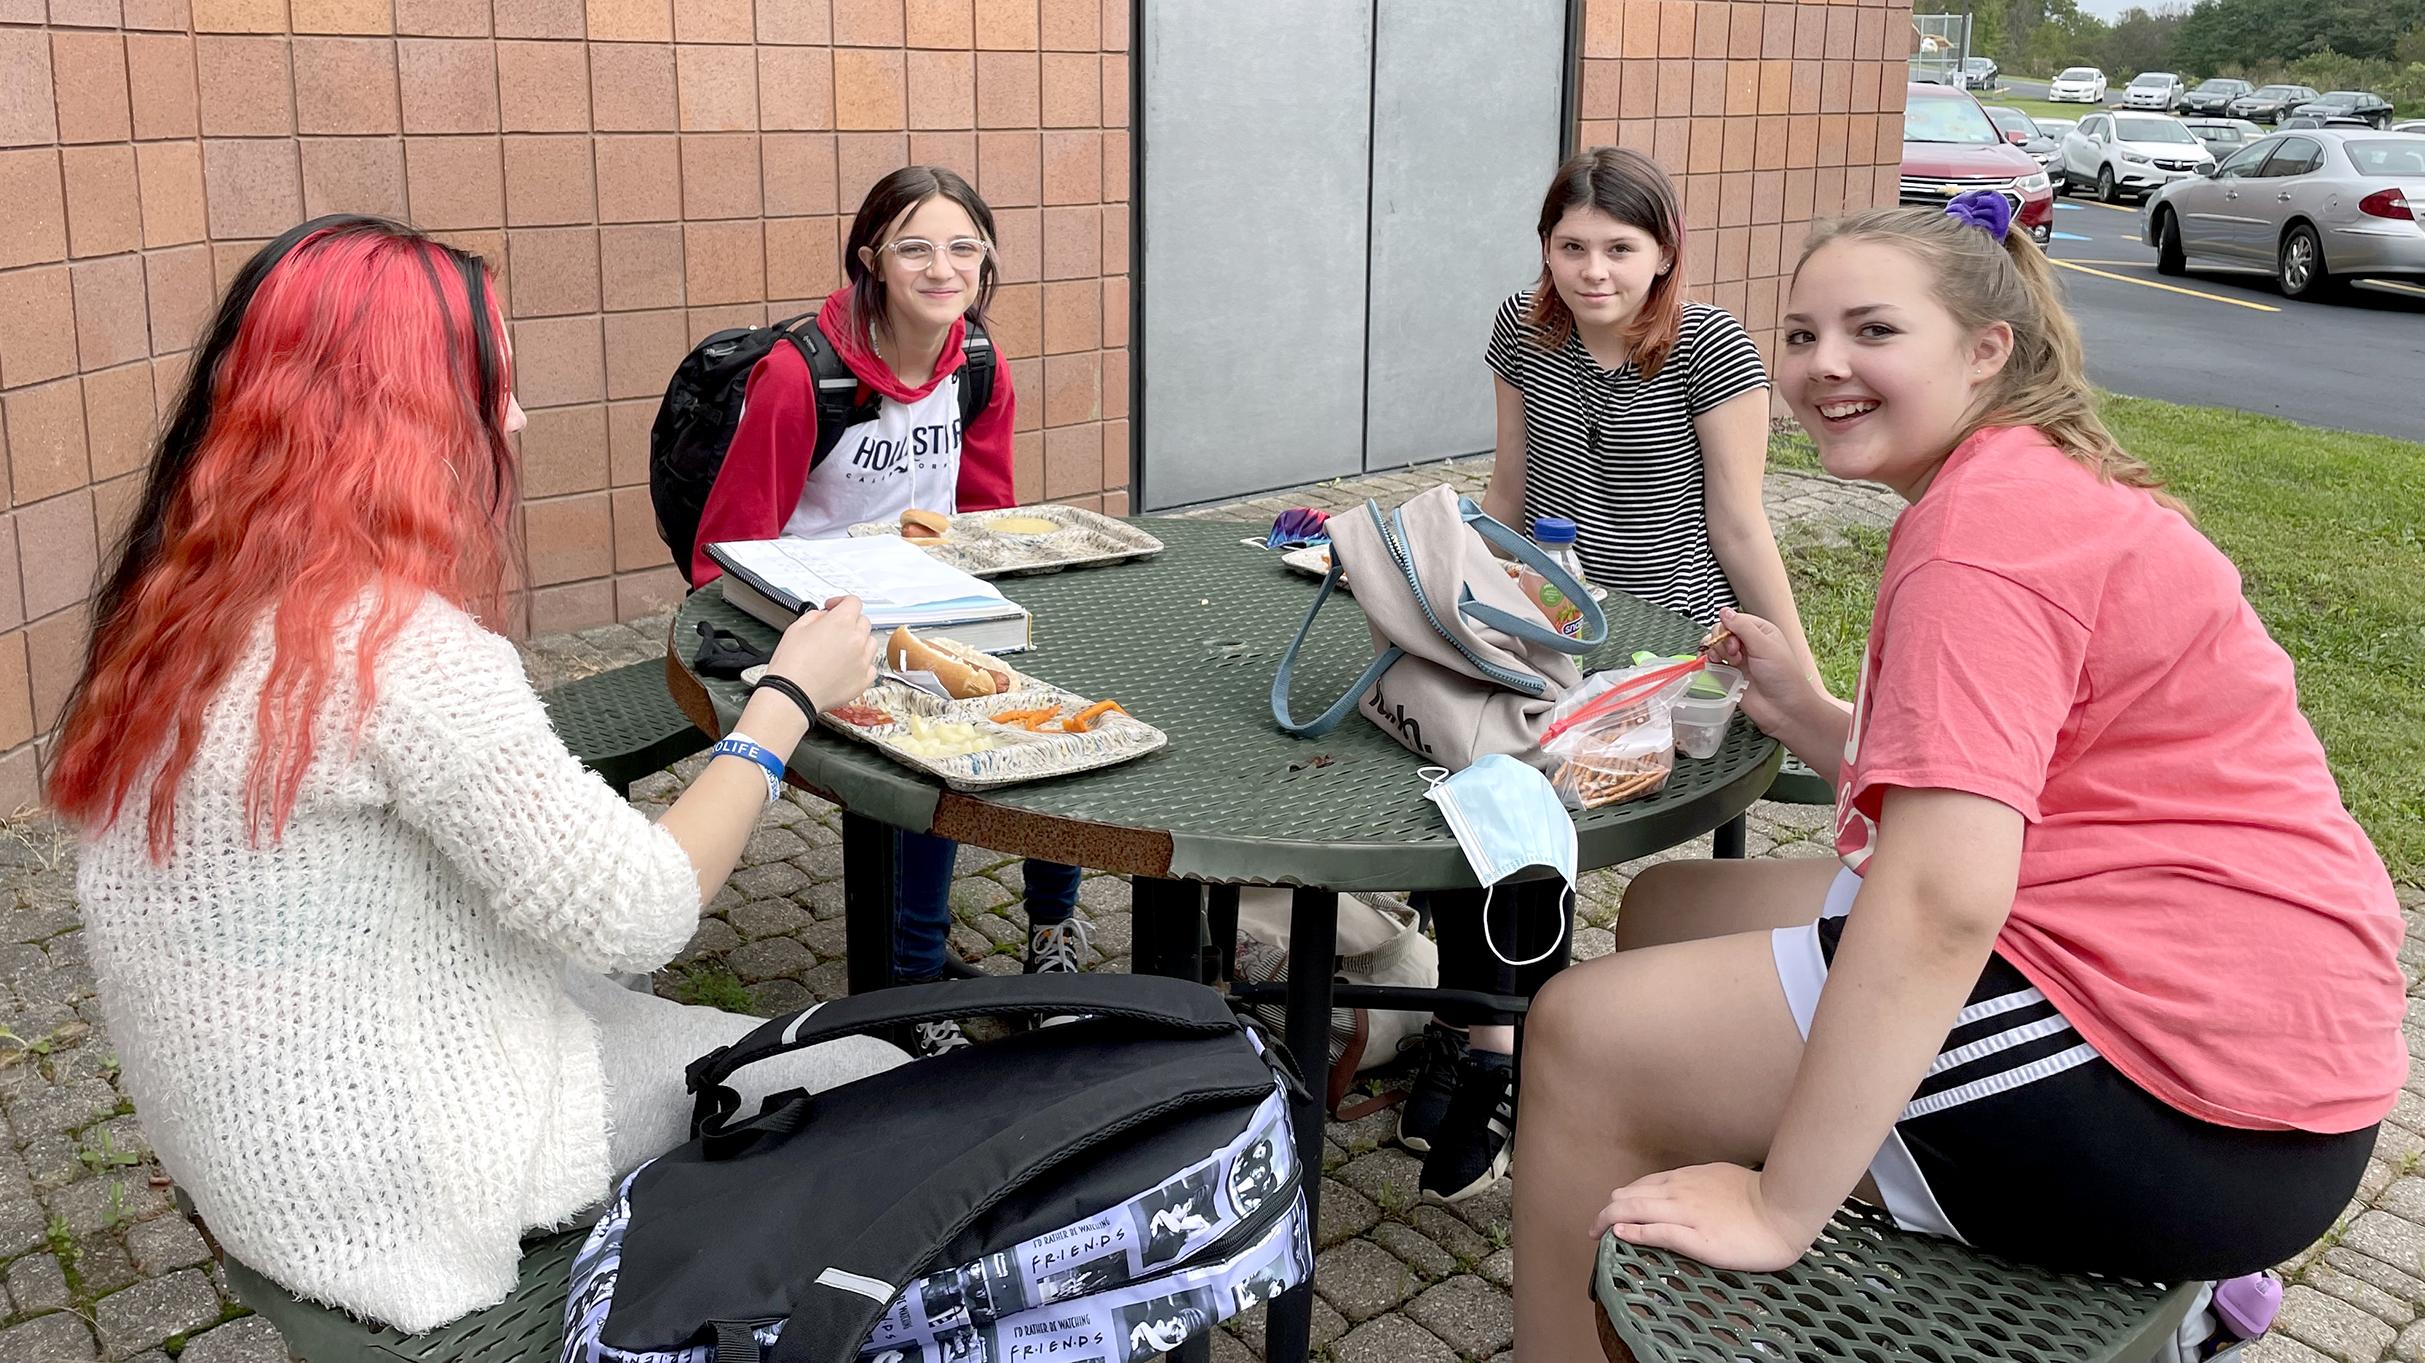 Students eating outside (9/2021)